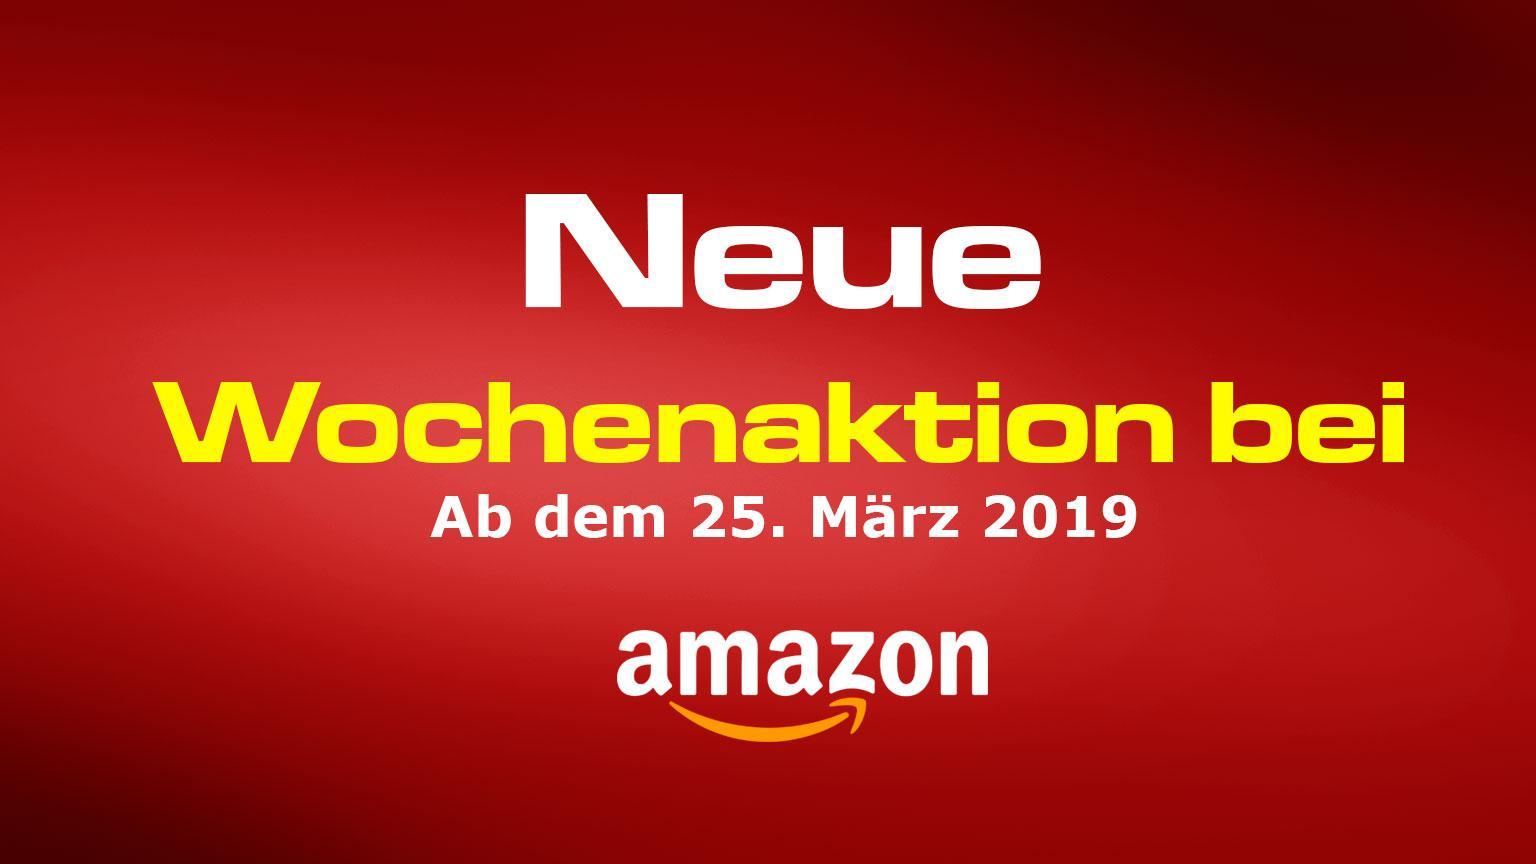 Neue Wochenaktionen bei Amazon.de Deal 25.03.2019